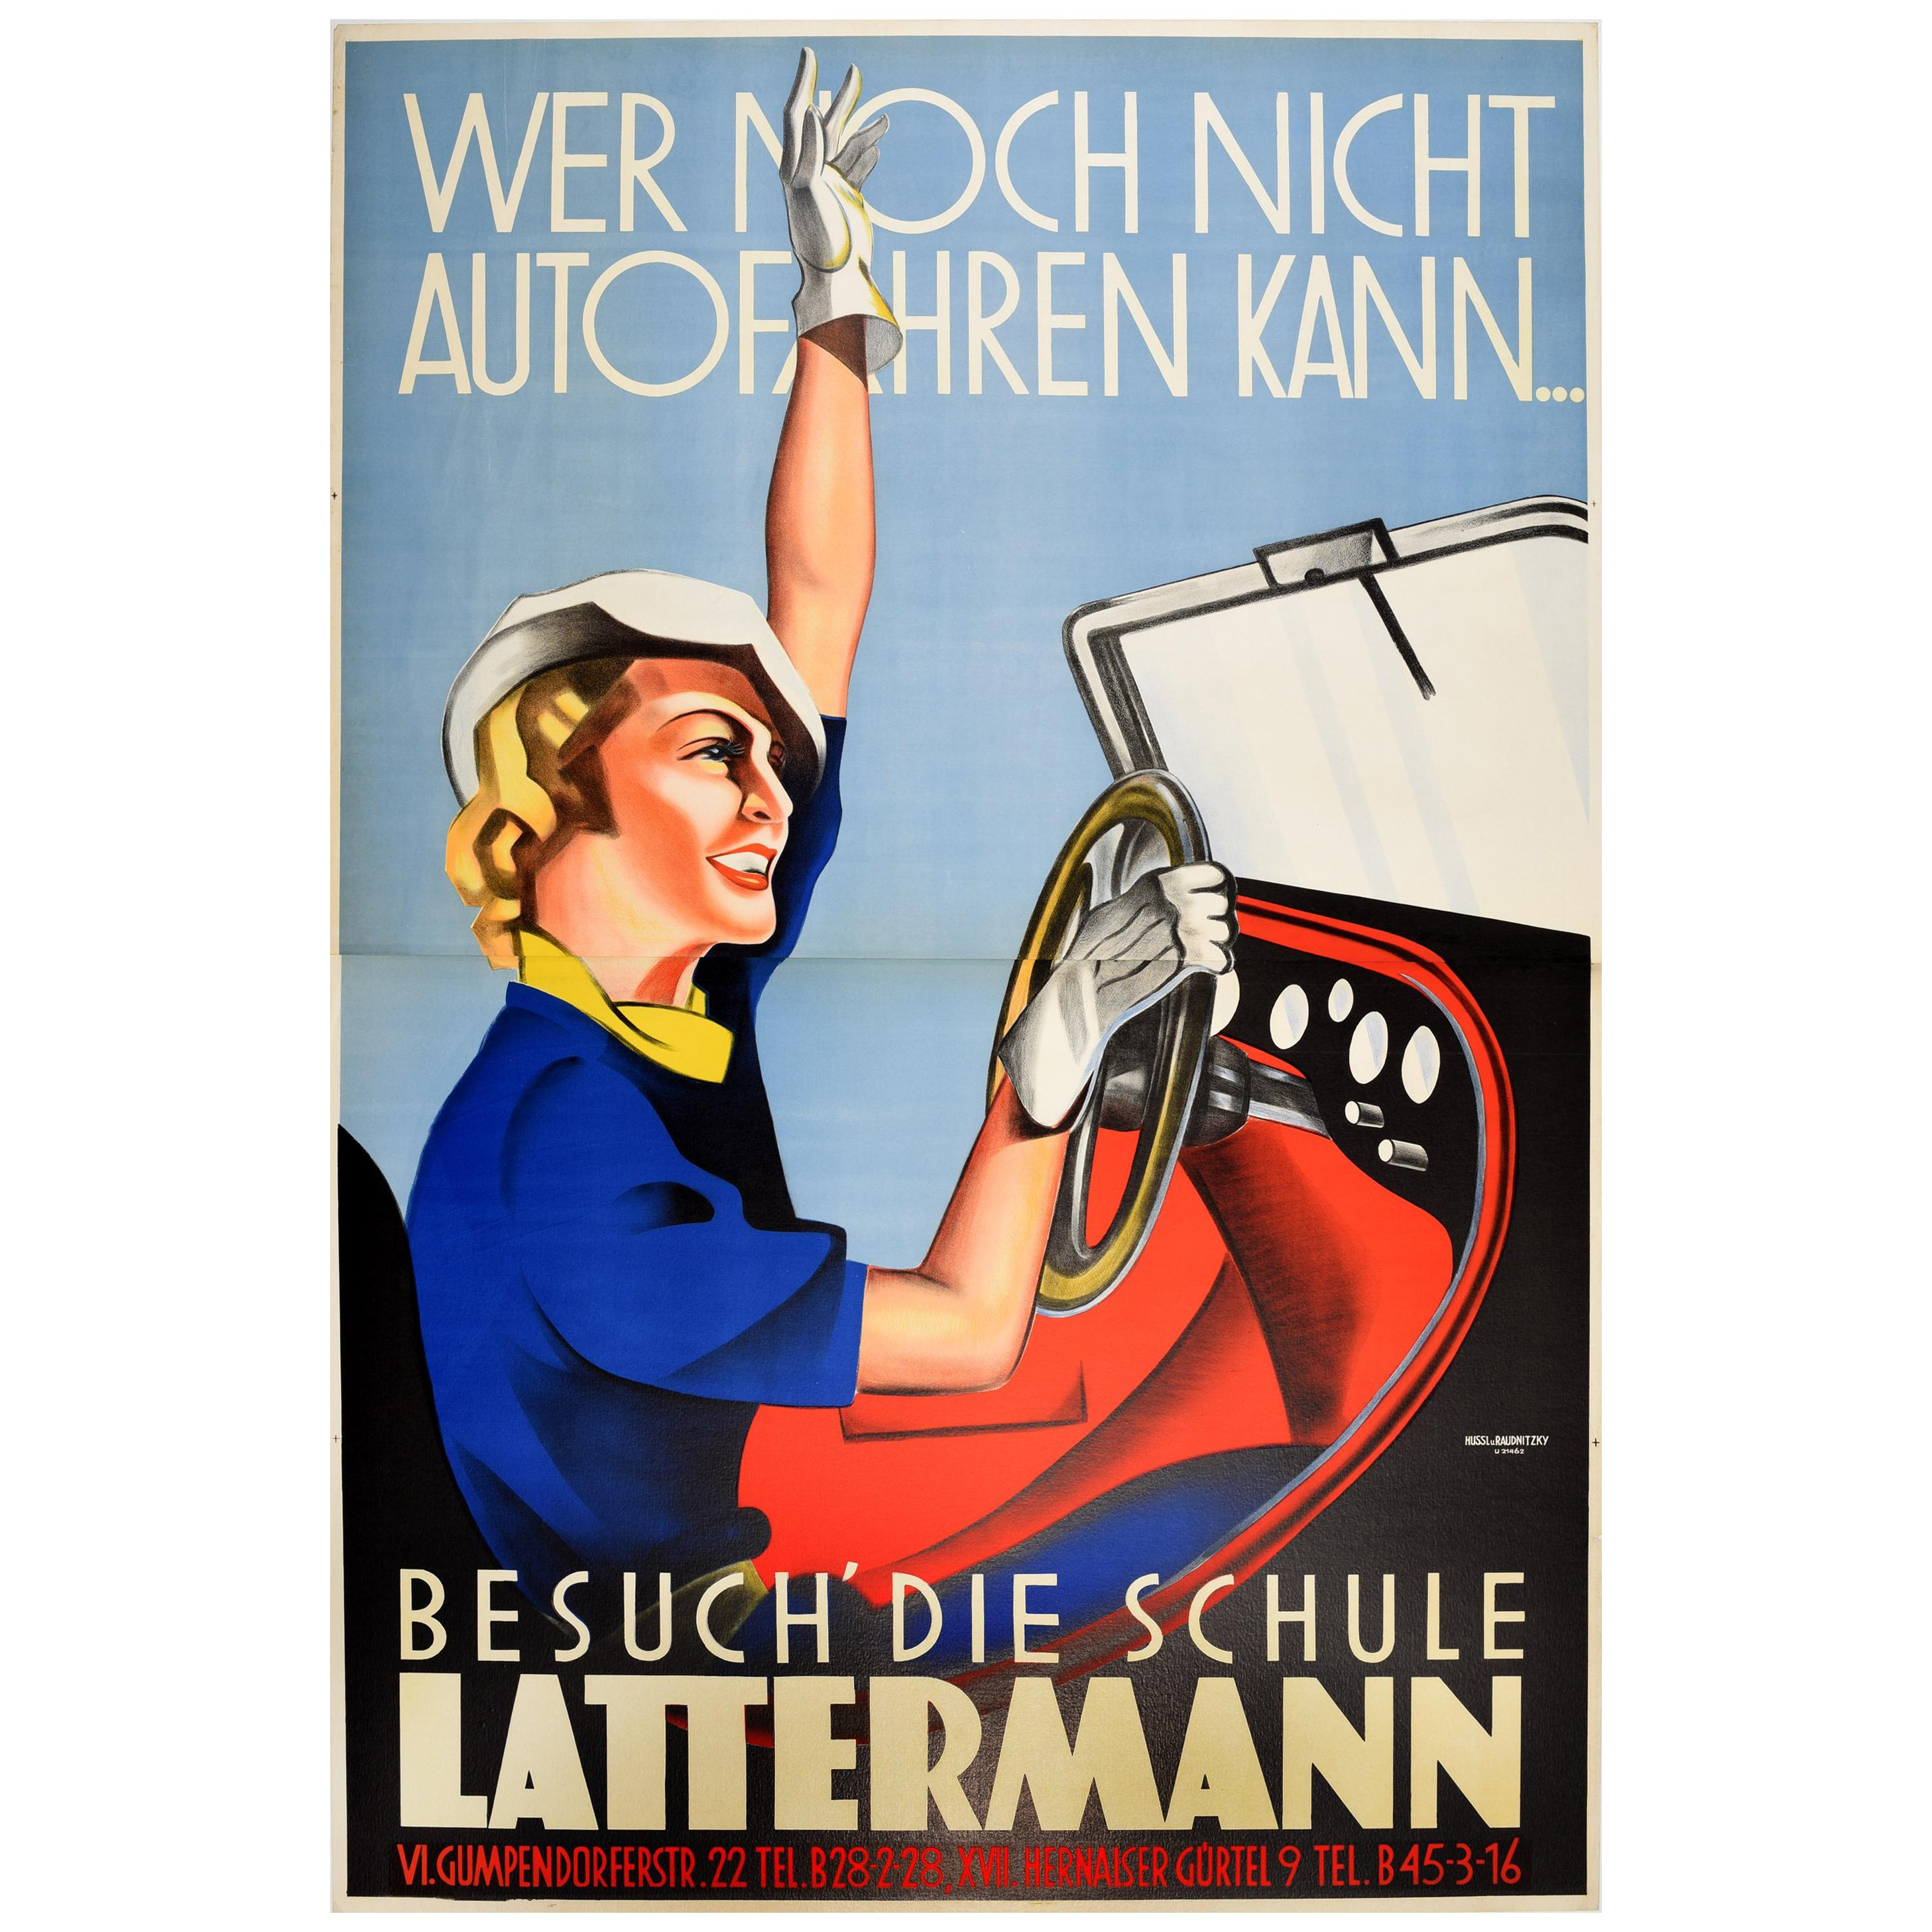 Original Vintage Art Deco Style Advertising Poster for Lattermann Driving School